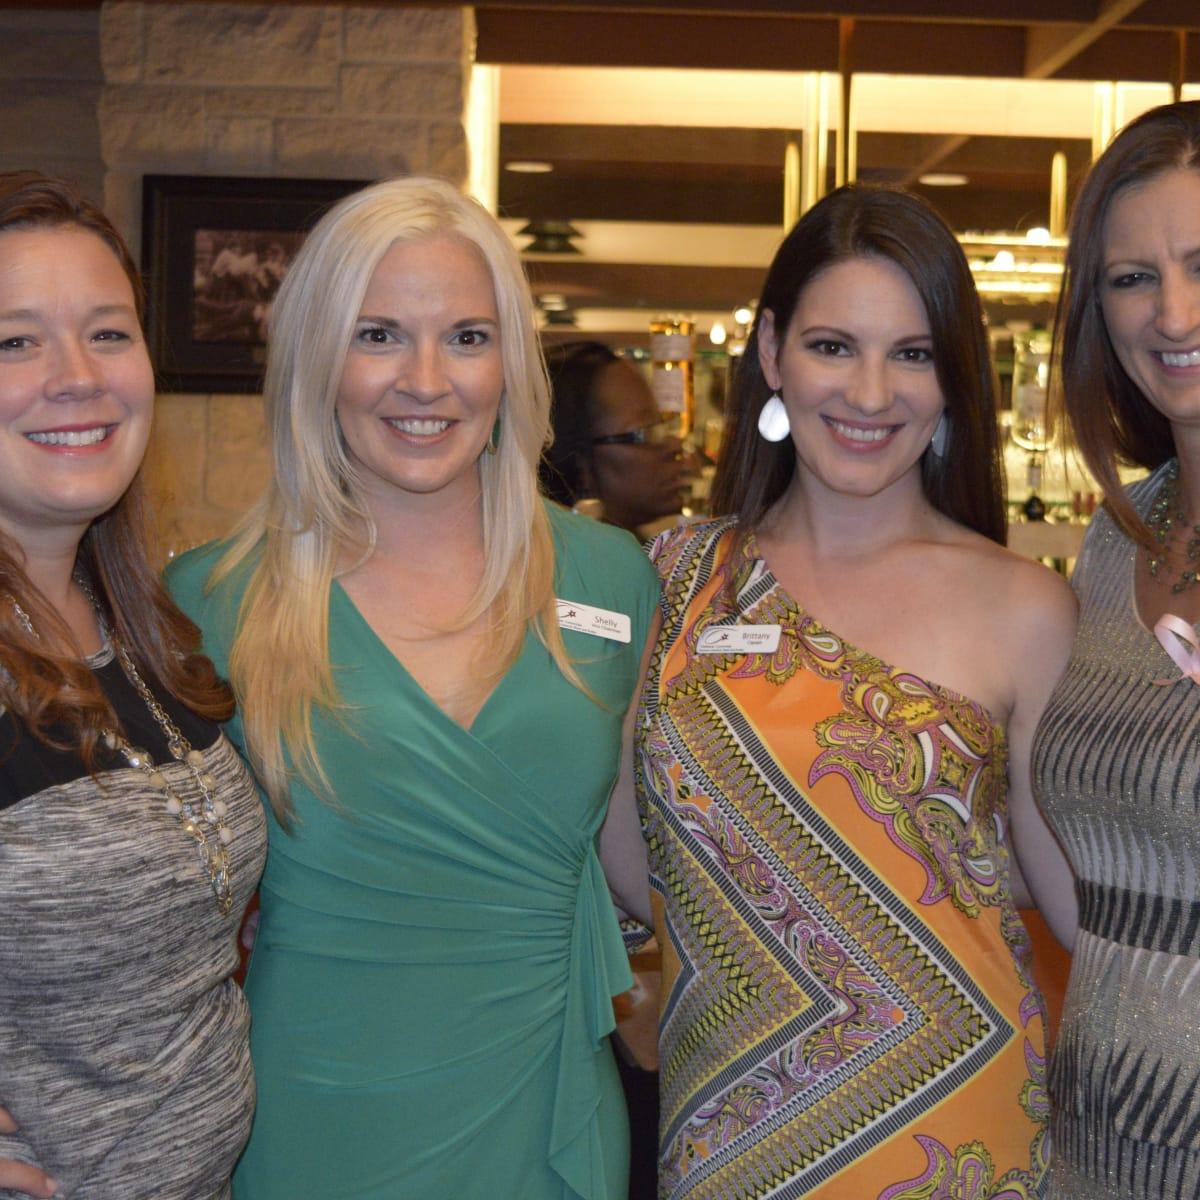 HLSR Trailblazers 2015 Lani Simonton, Shelly Brock, Brittany Kabel, Mandi Day